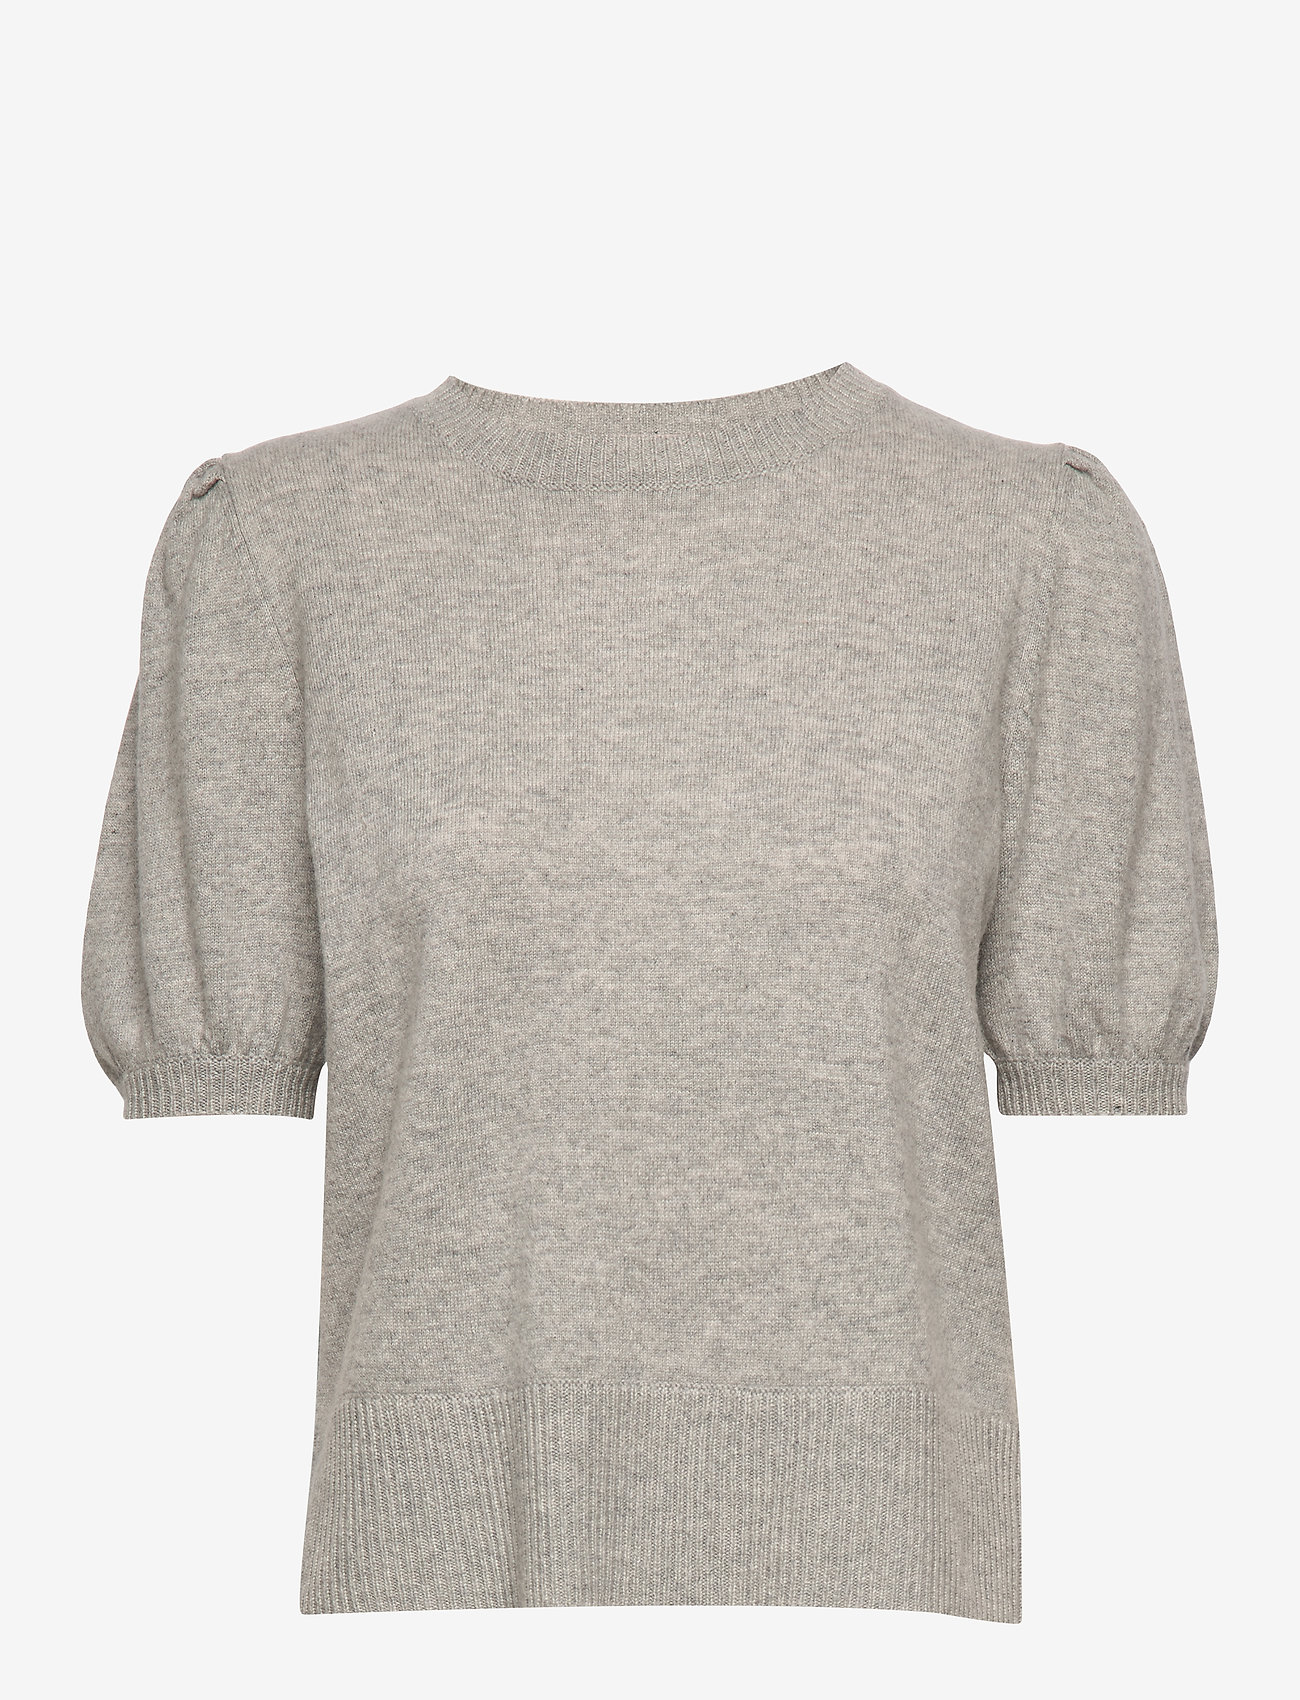 Davida Cashmere - Puff Shoulder Top - knitted tops - light grey - 0